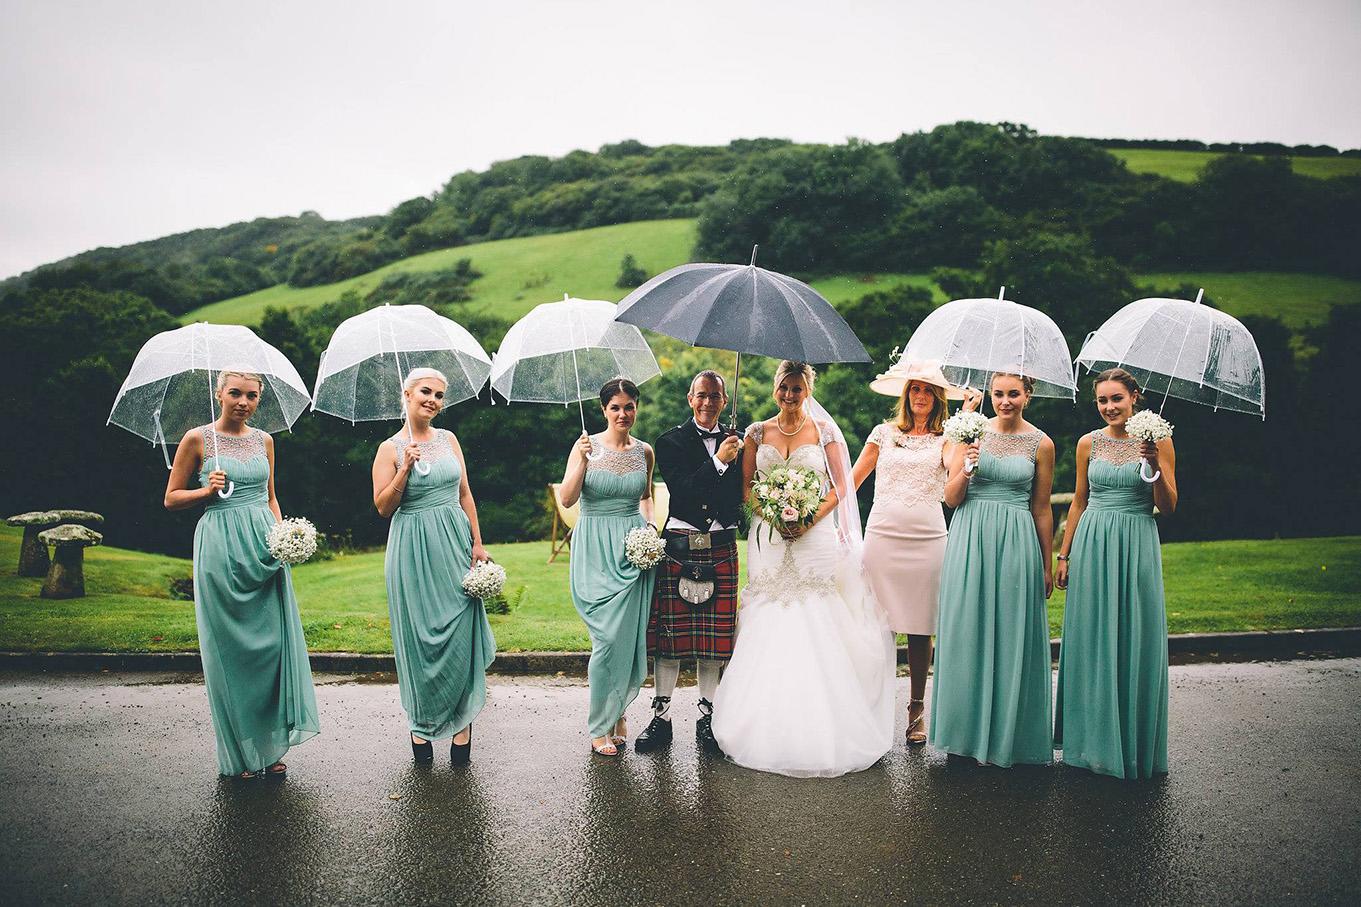 Real wedding at Pengenna Manor in Cornwall wedding venue Hannah & Liam 05.jpg